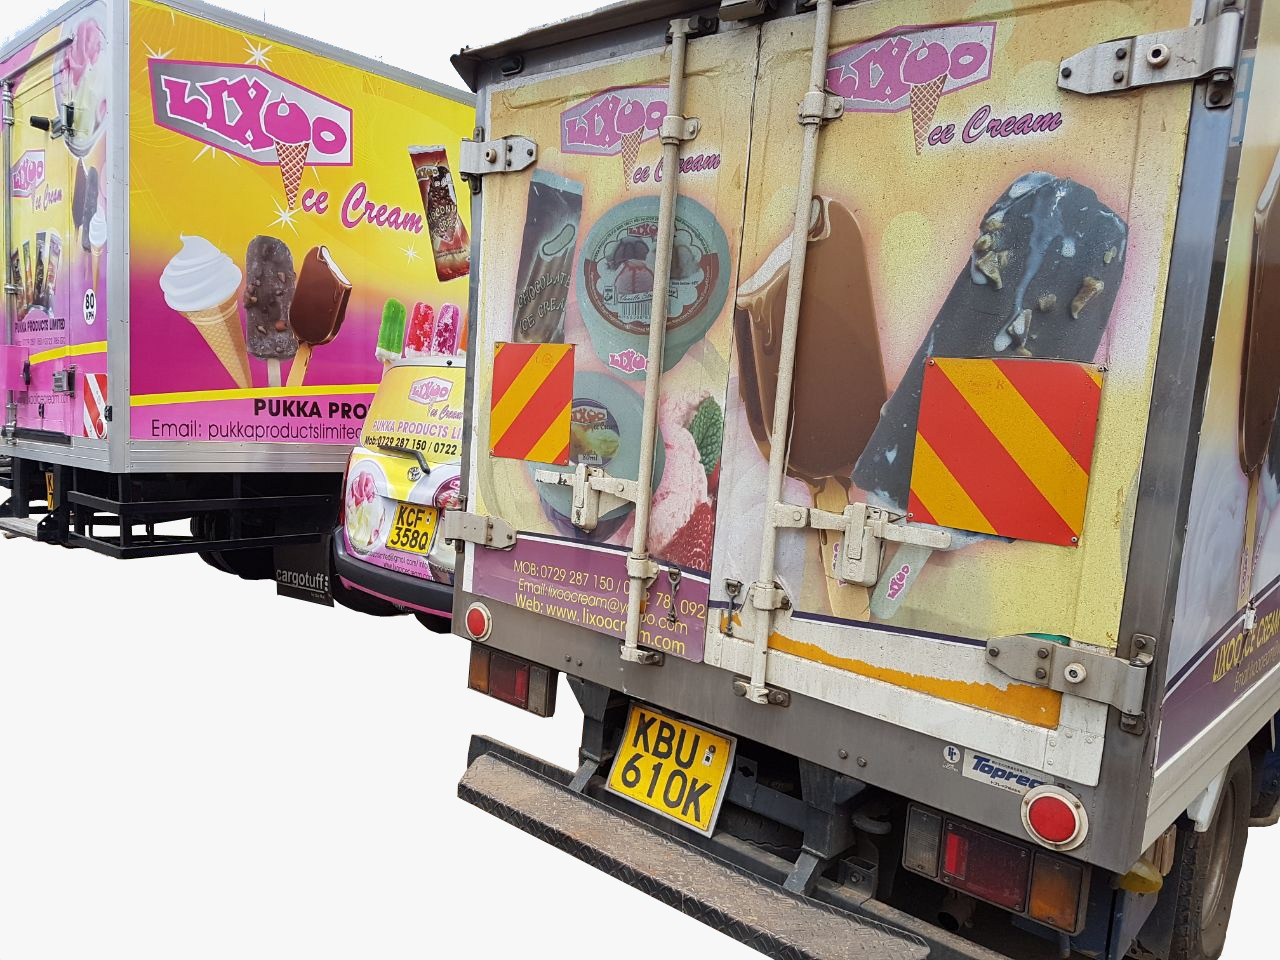 Lixoo Ice Cream | Ice Cream Company in (Nairobi) Kenya